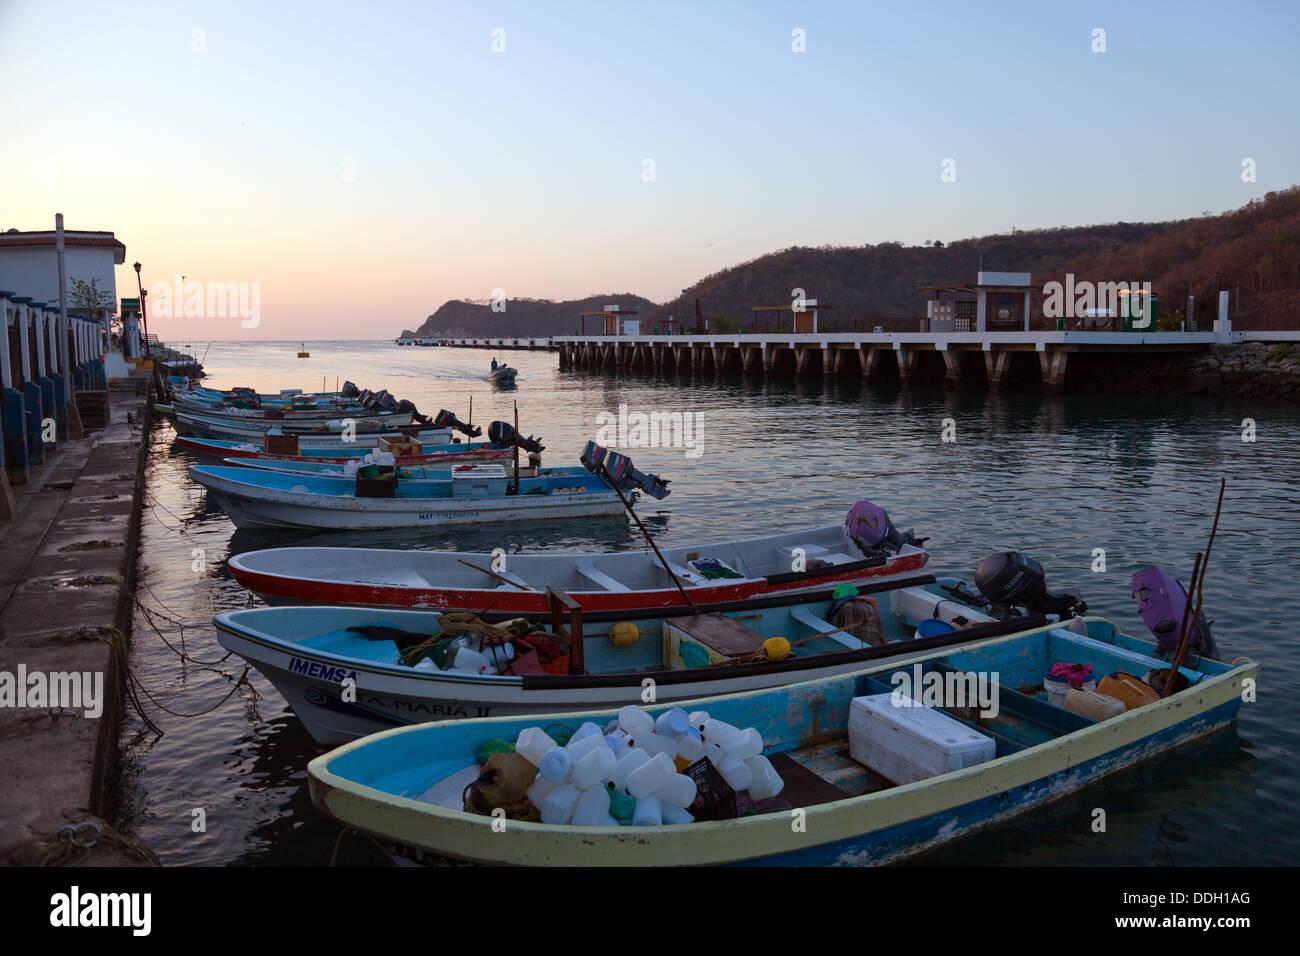 Sunrise at the marina, Bahia de Santa Cruz, in Huatulco, Mexico. Stock Photo